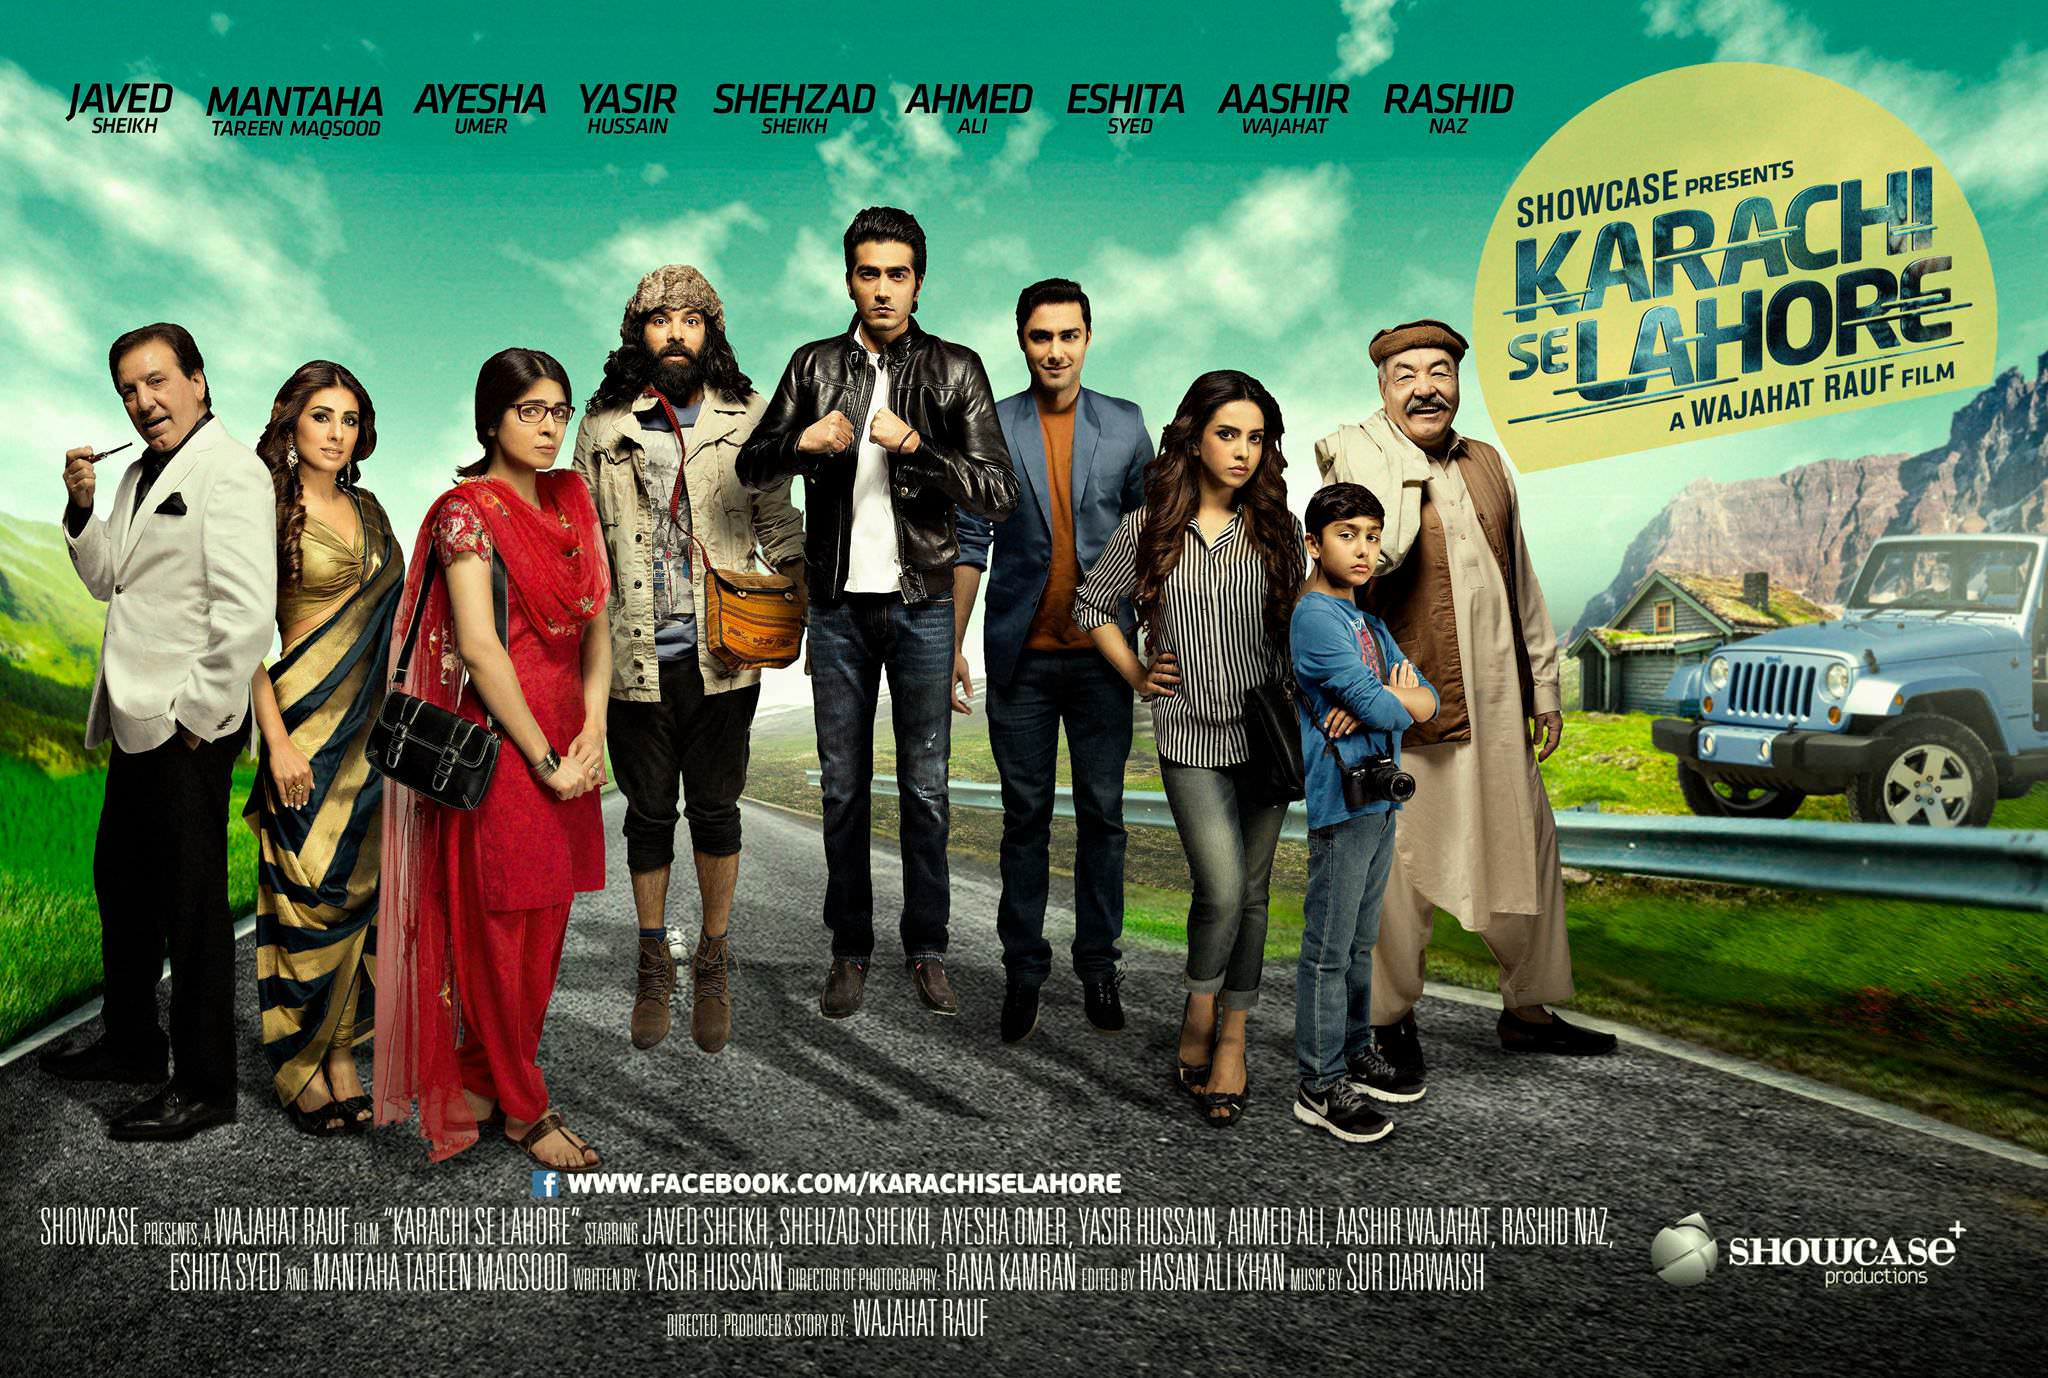 Karachi se Lahore (2015)